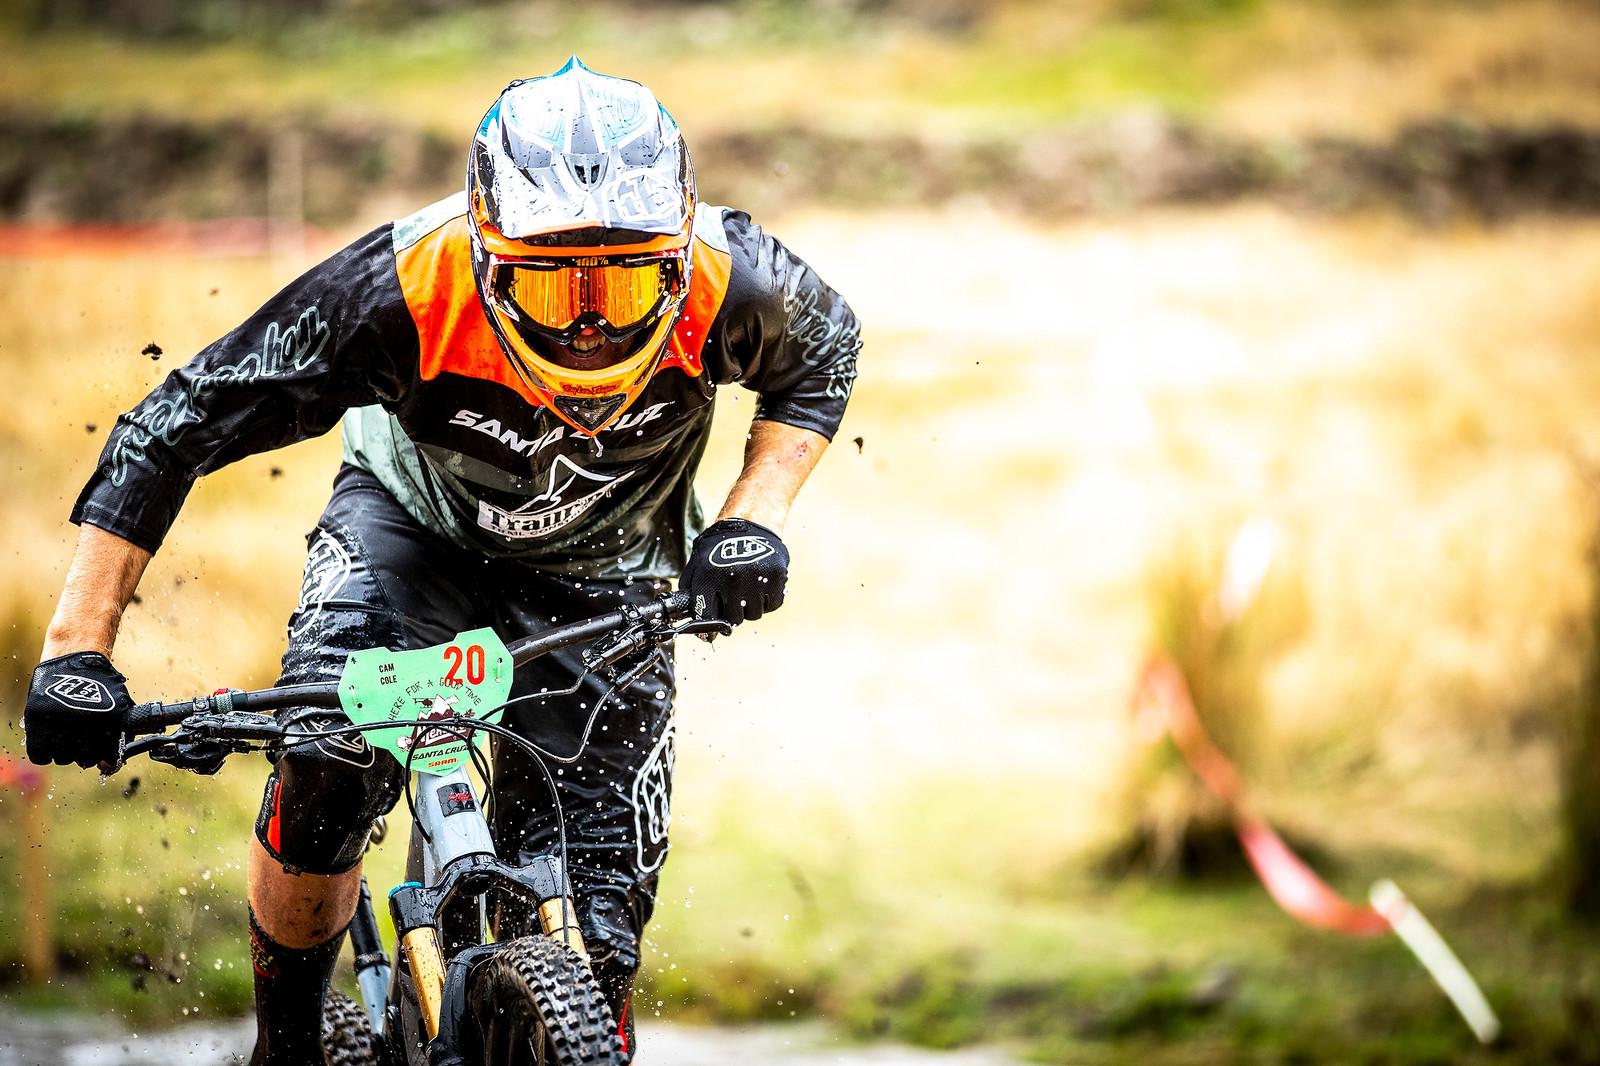 NZEnduro19  m1 9564 - 2019 NZ Enduro Day 3 Photo Gallery - Mountain Biking Pictures - Vital MTB